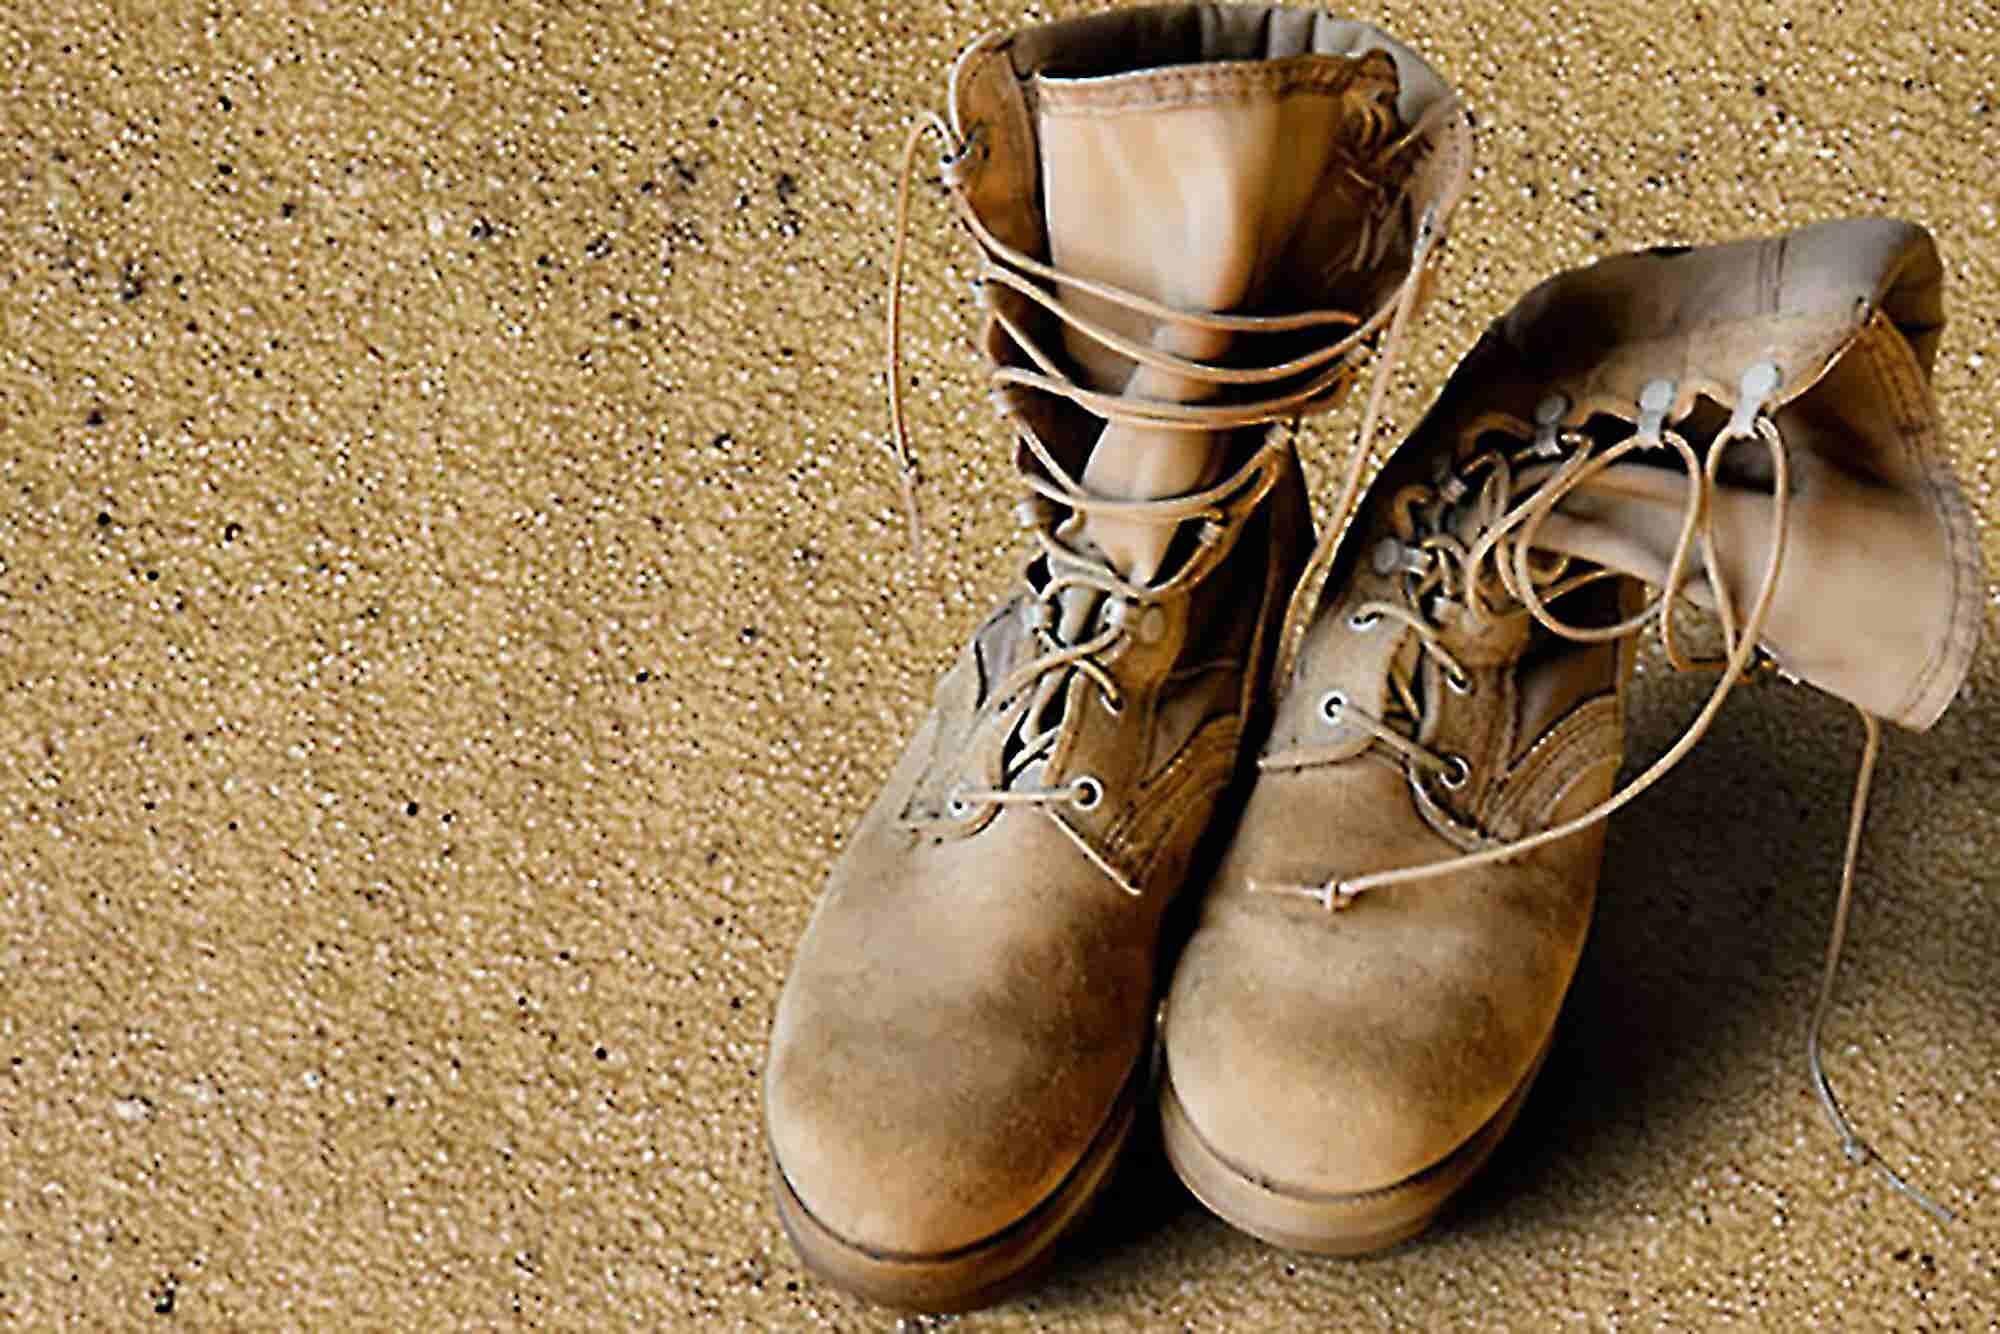 75 Franchises Helping Pay Back Veterans